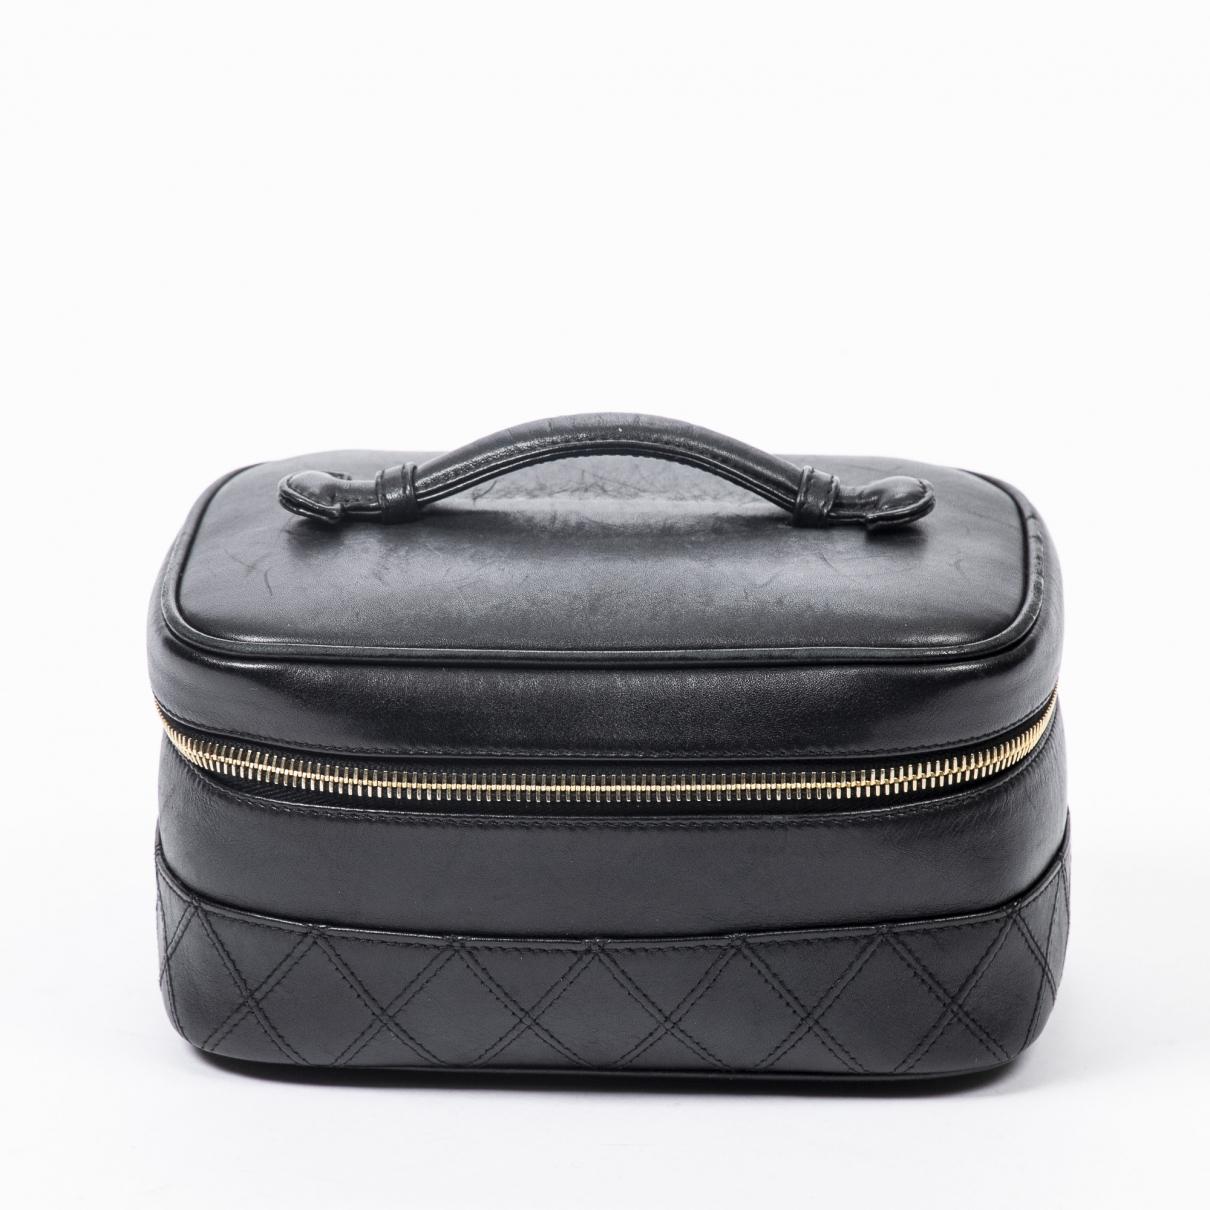 Chanel \N Black Leather Clutch bag for Women \N